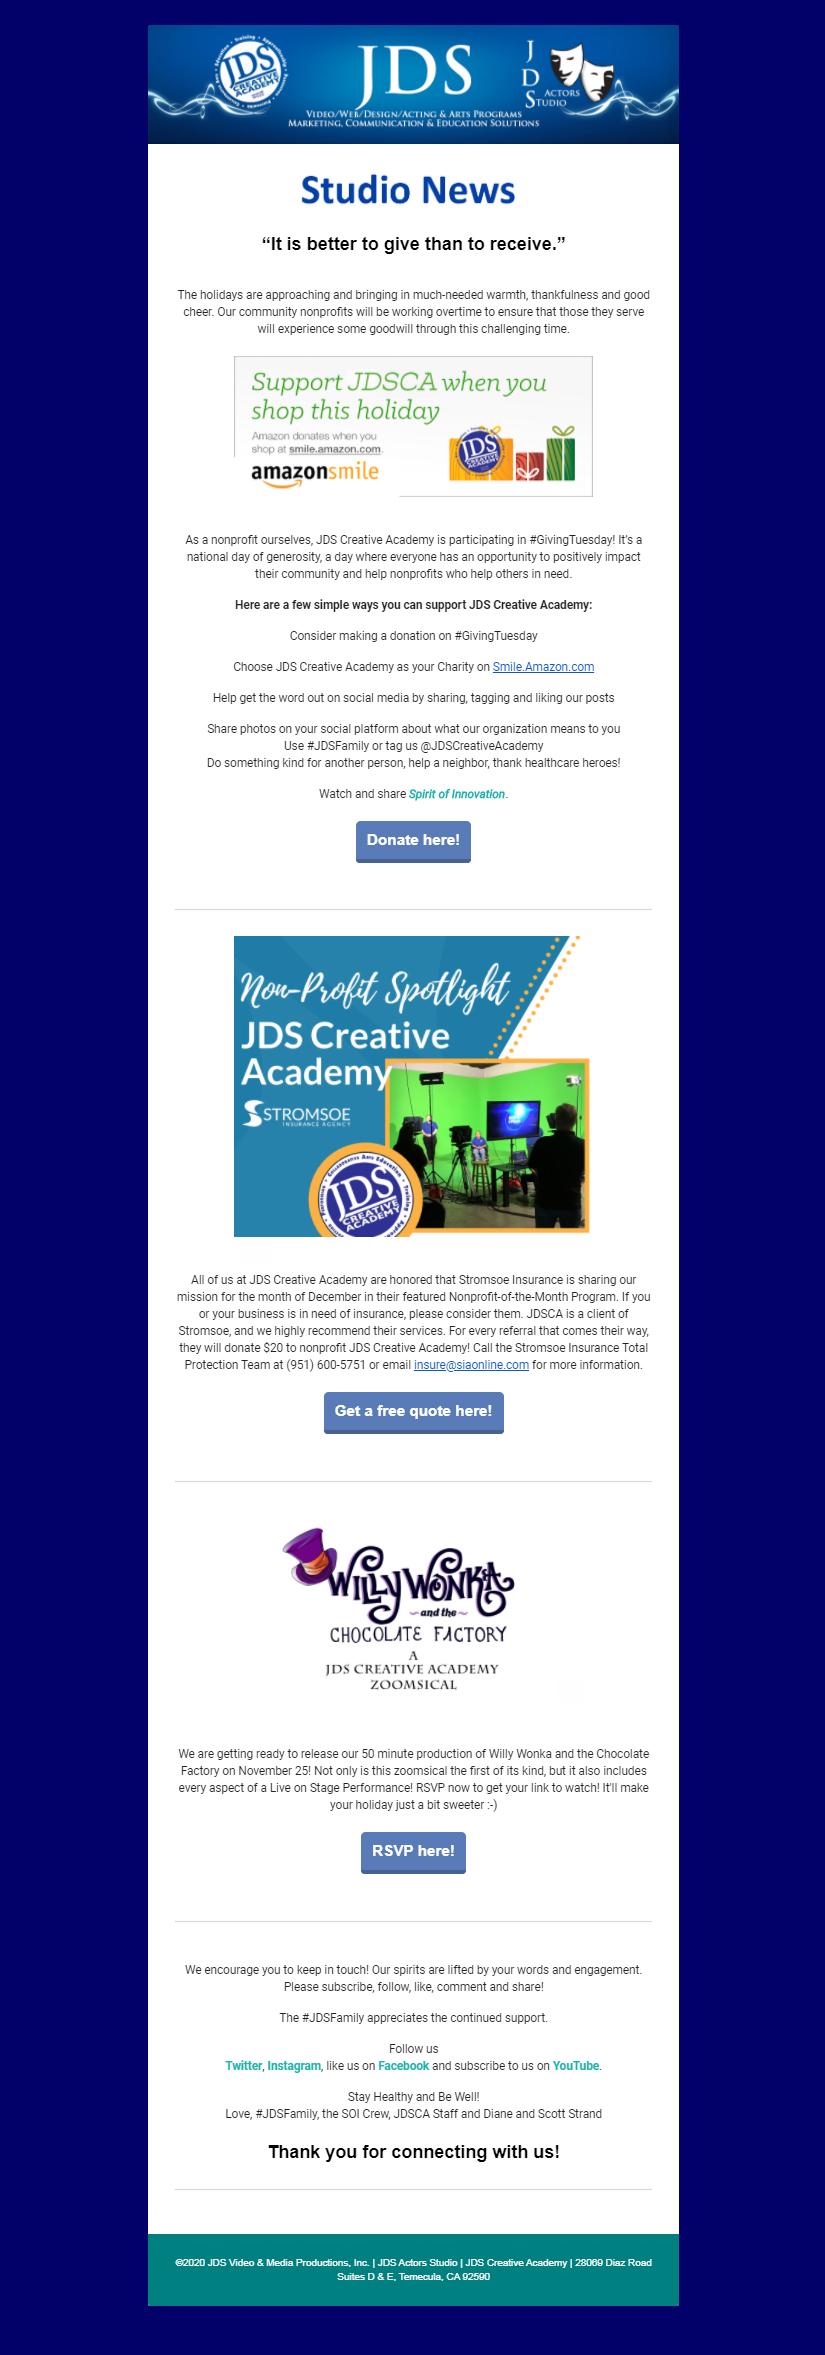 Ways to Support JDSCA